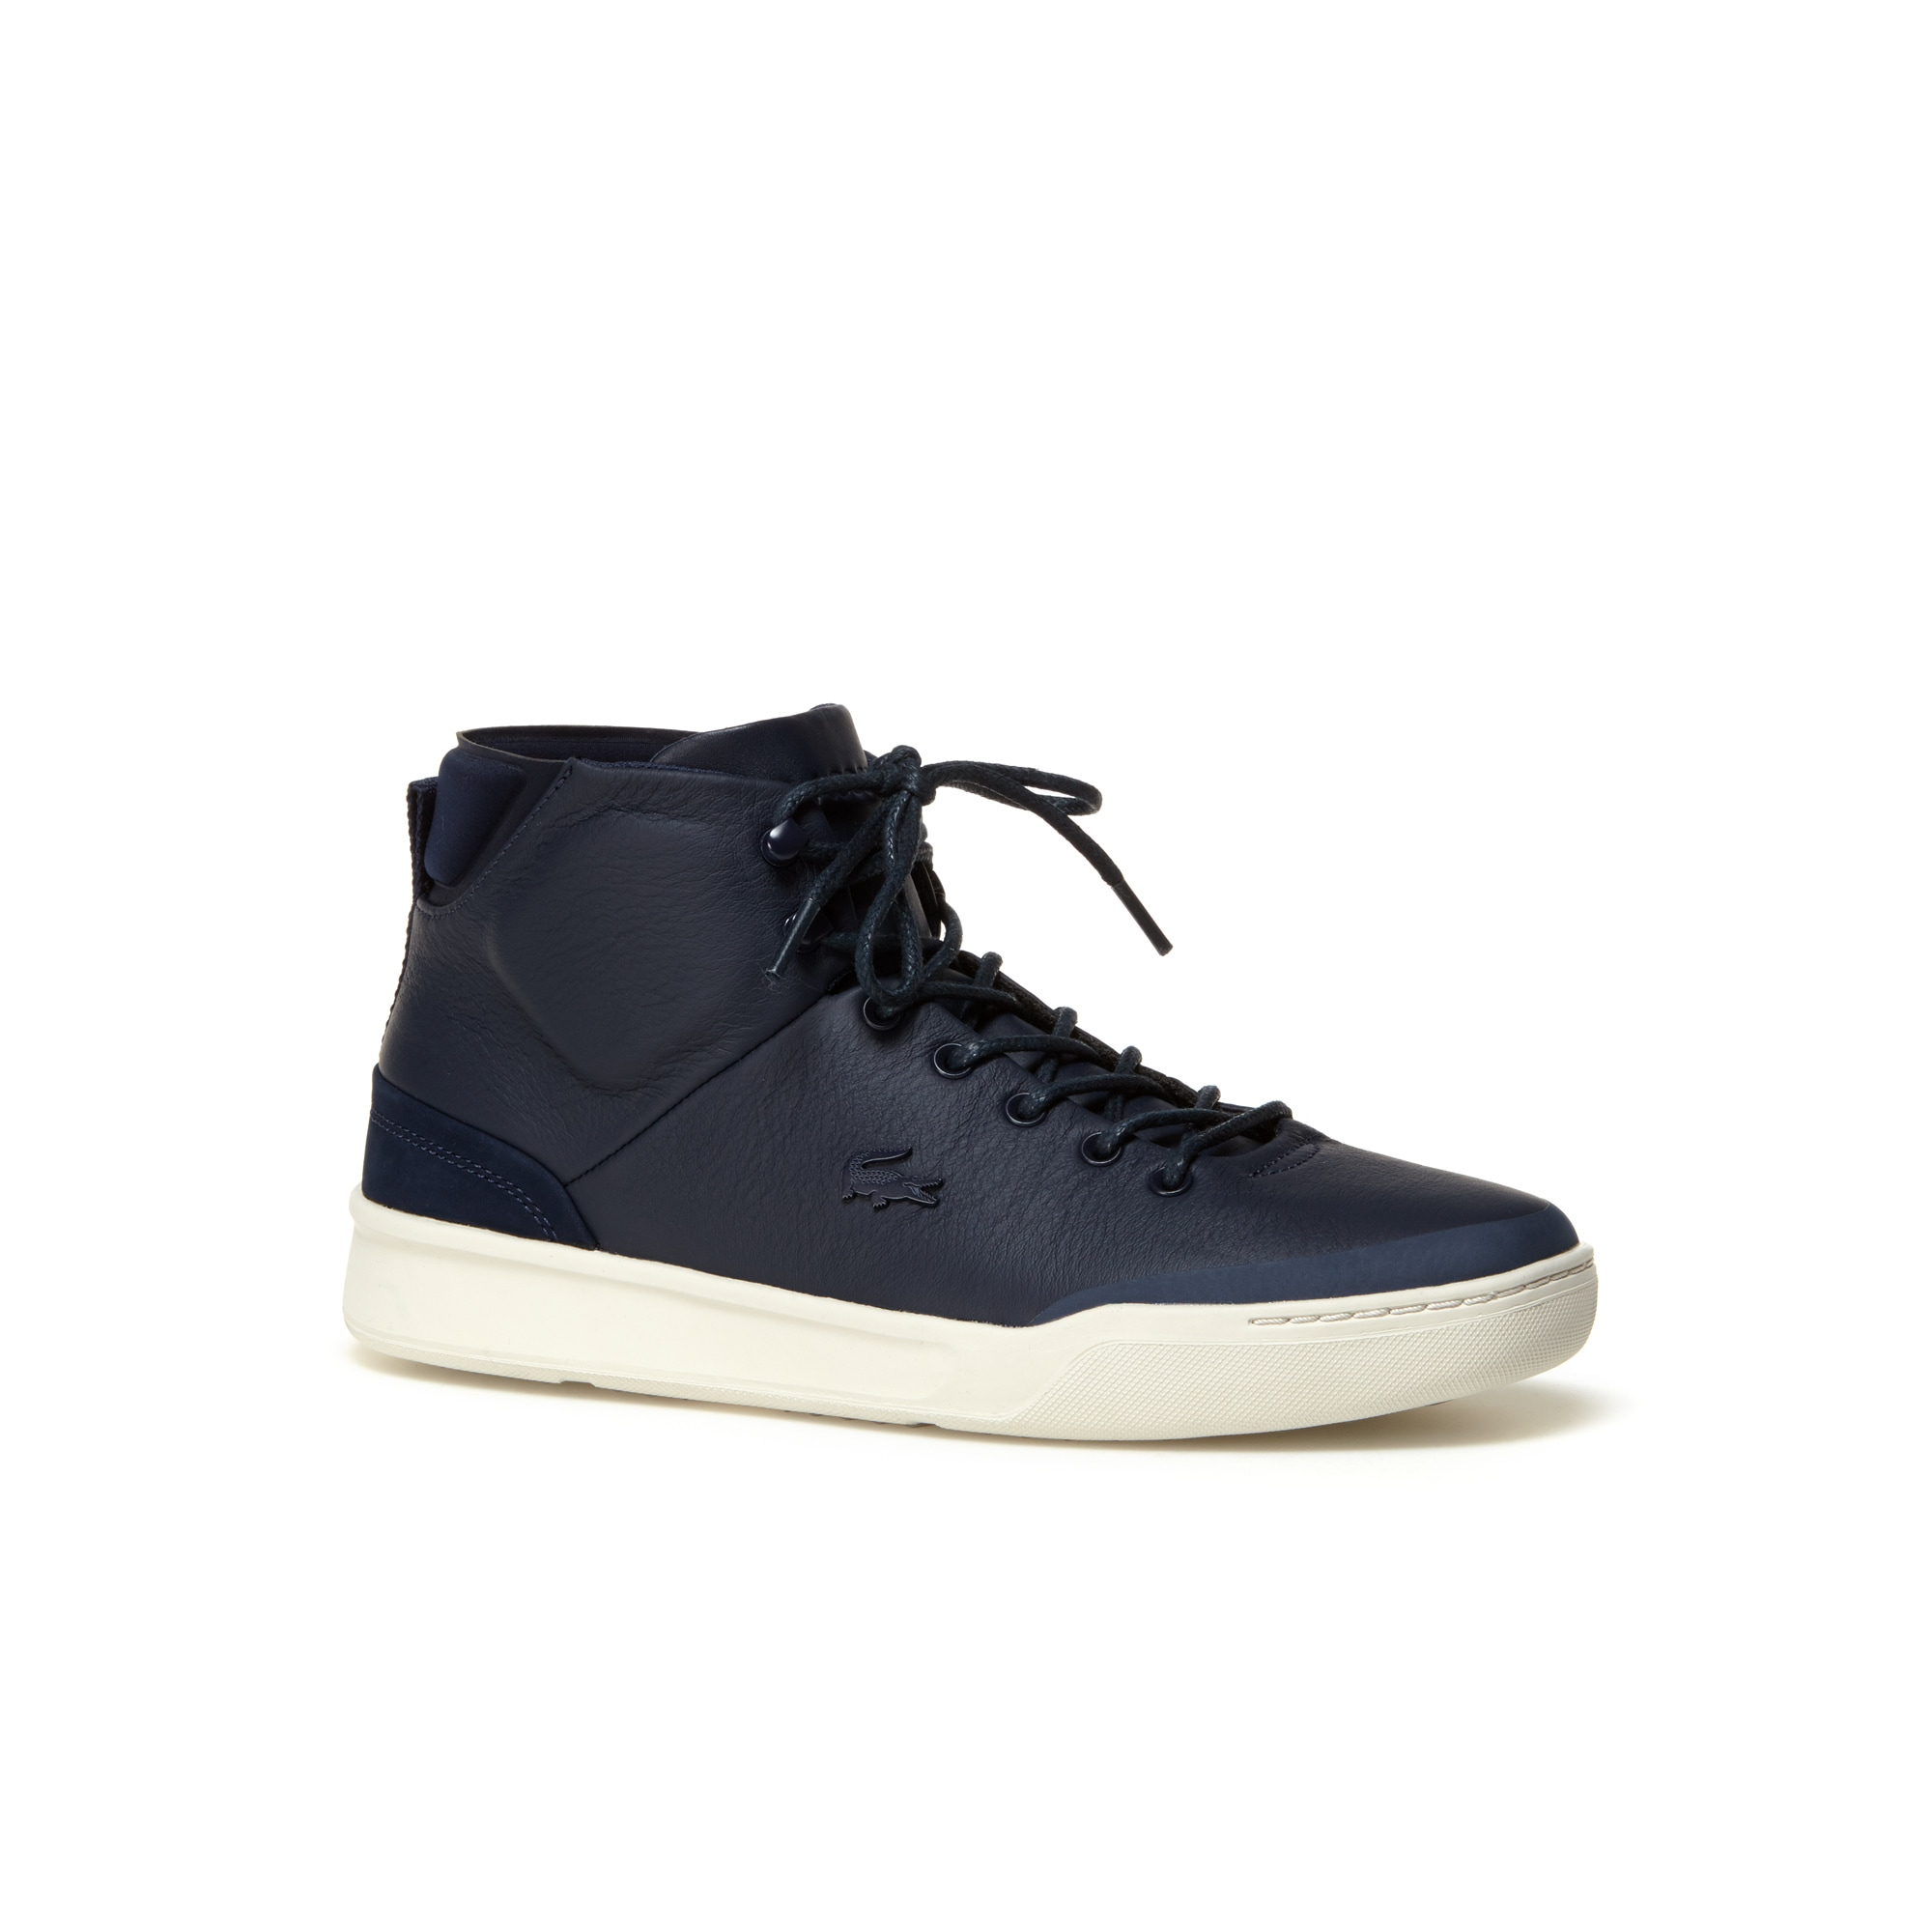 Men's Explorateur Classic Mid Leather Sneakers